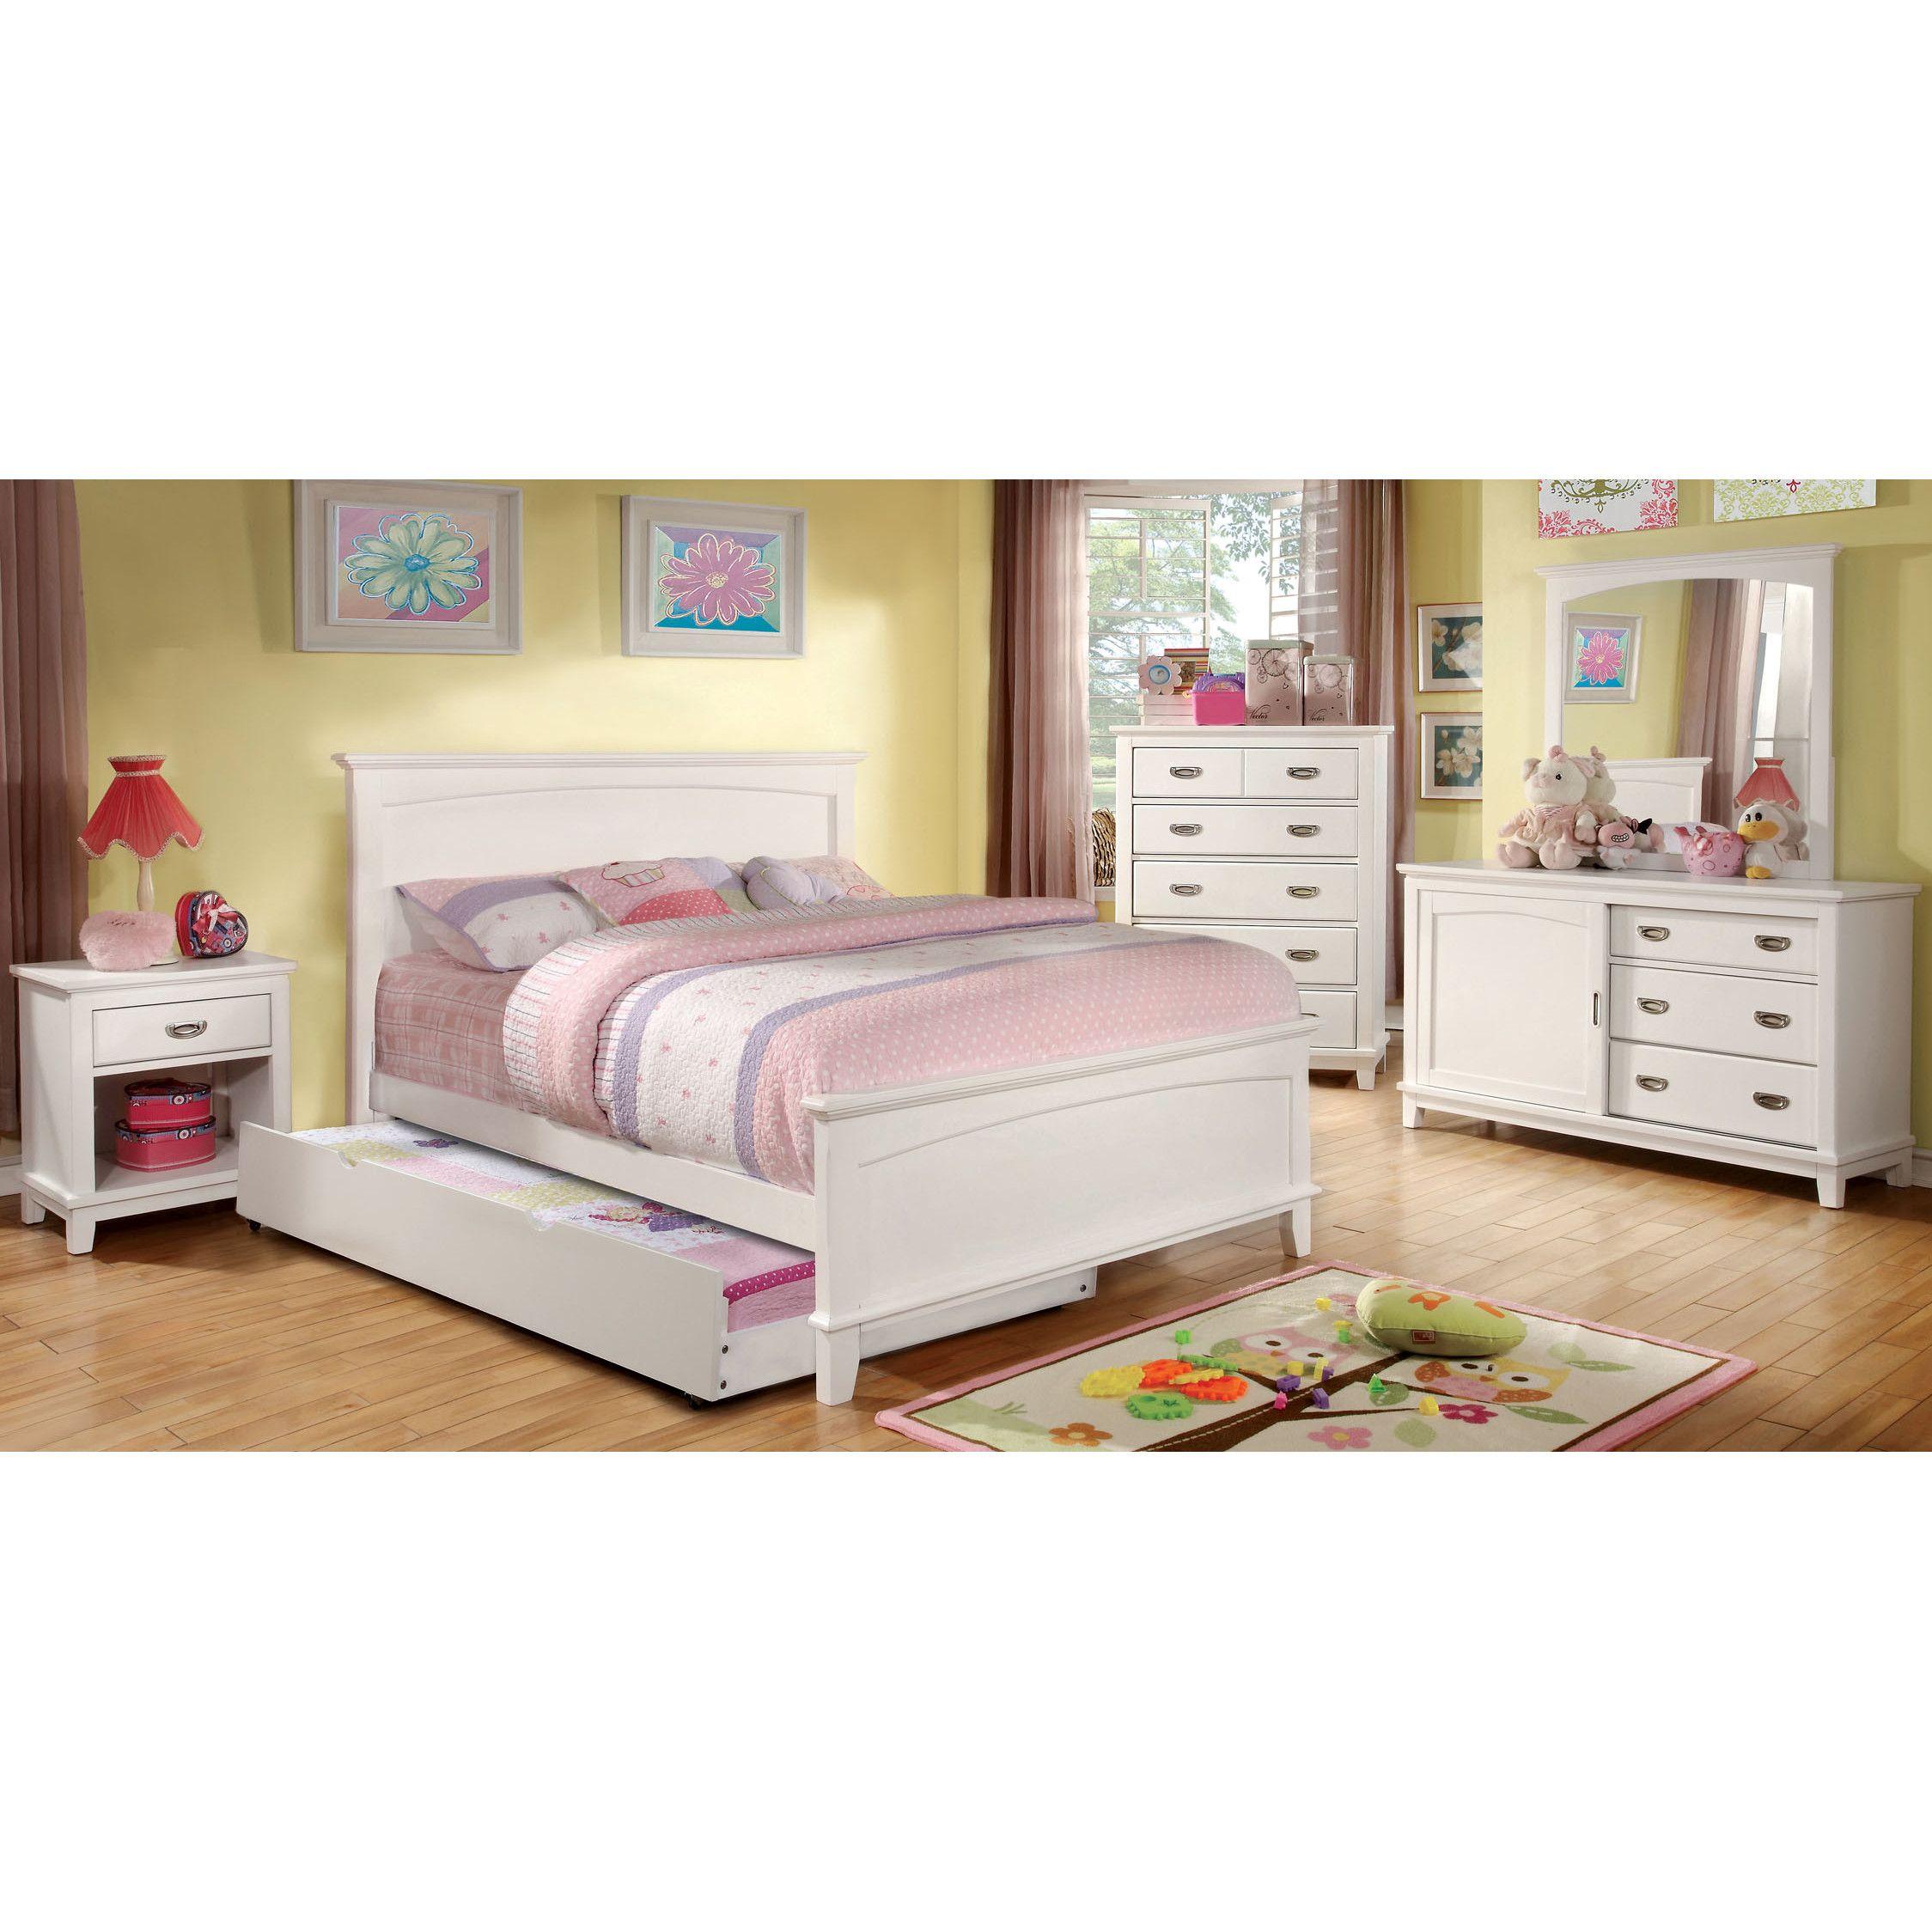 Hokku Designs Panel Bed Full size bed frame, Bed